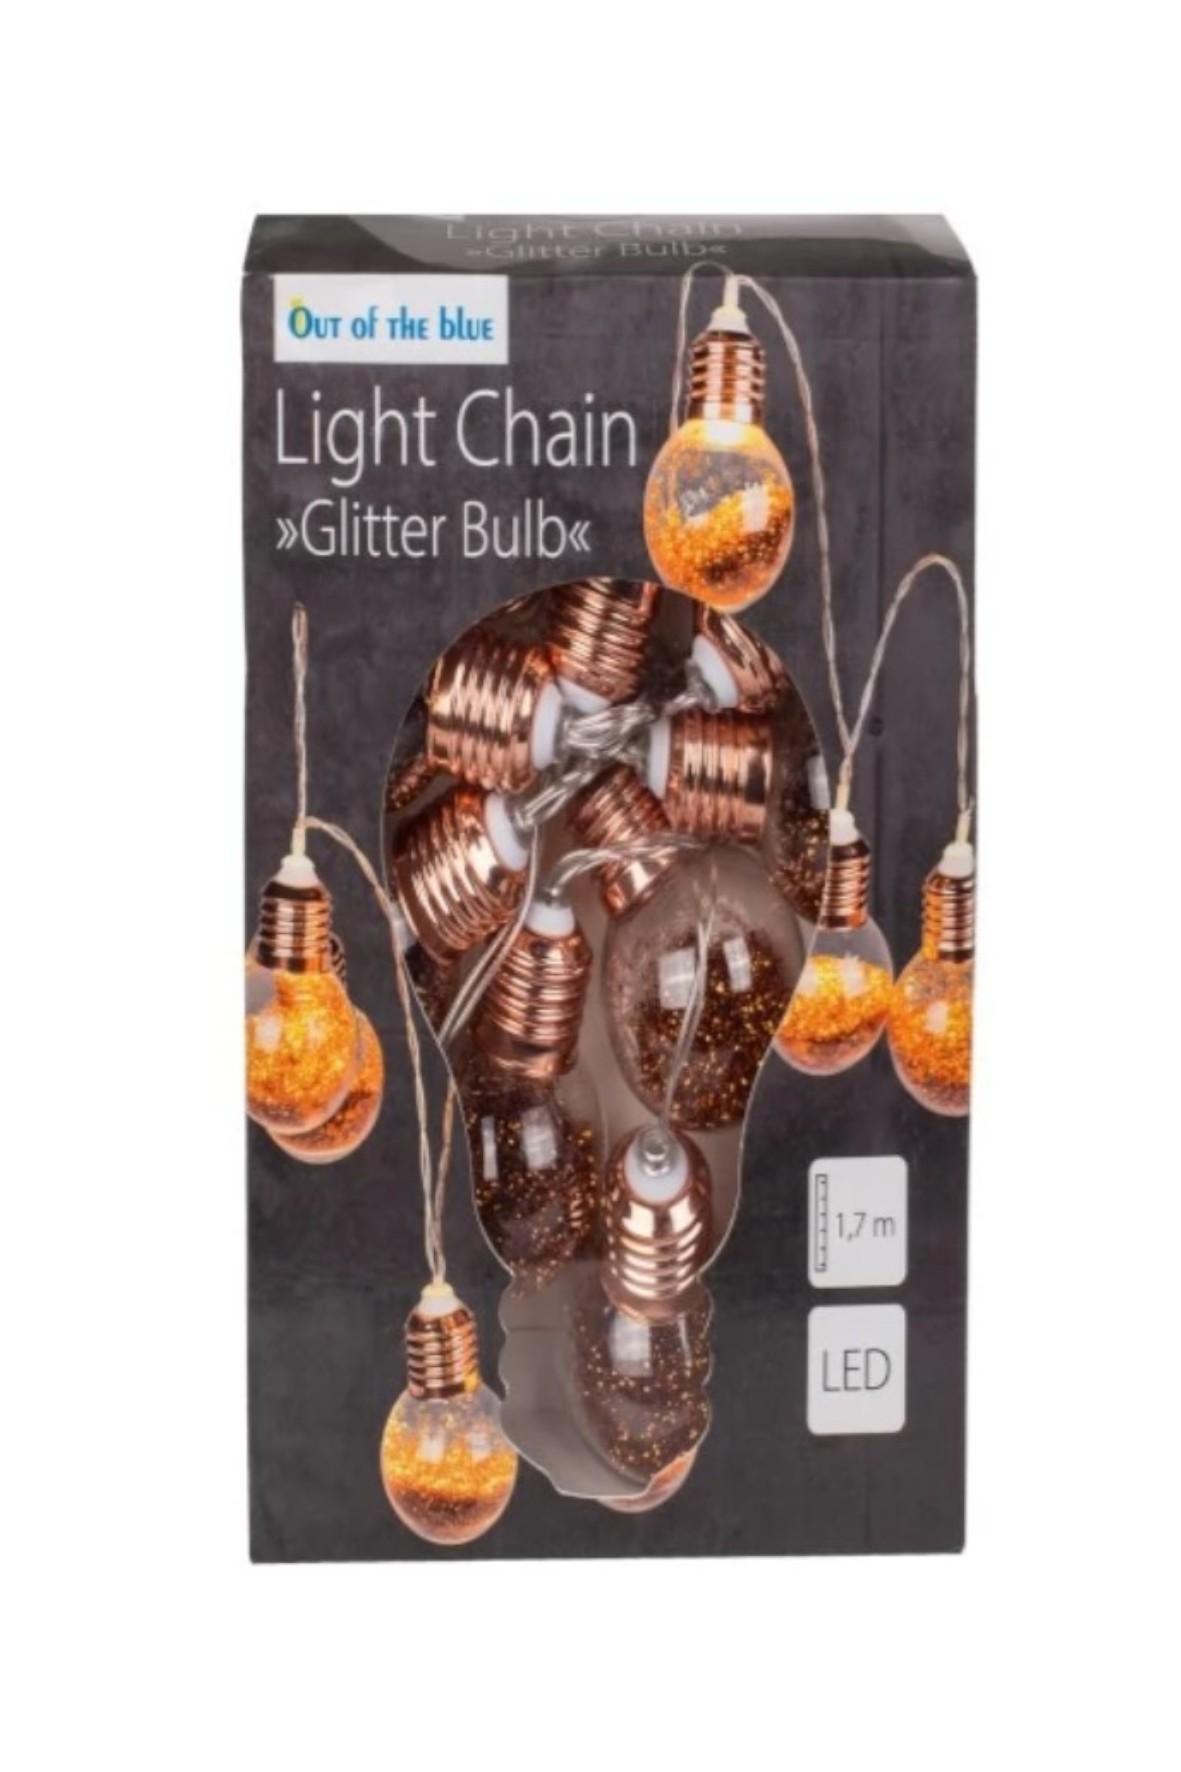 Lampki dekoracyjne Glitter Bulbs - 10 LED 1,7metra